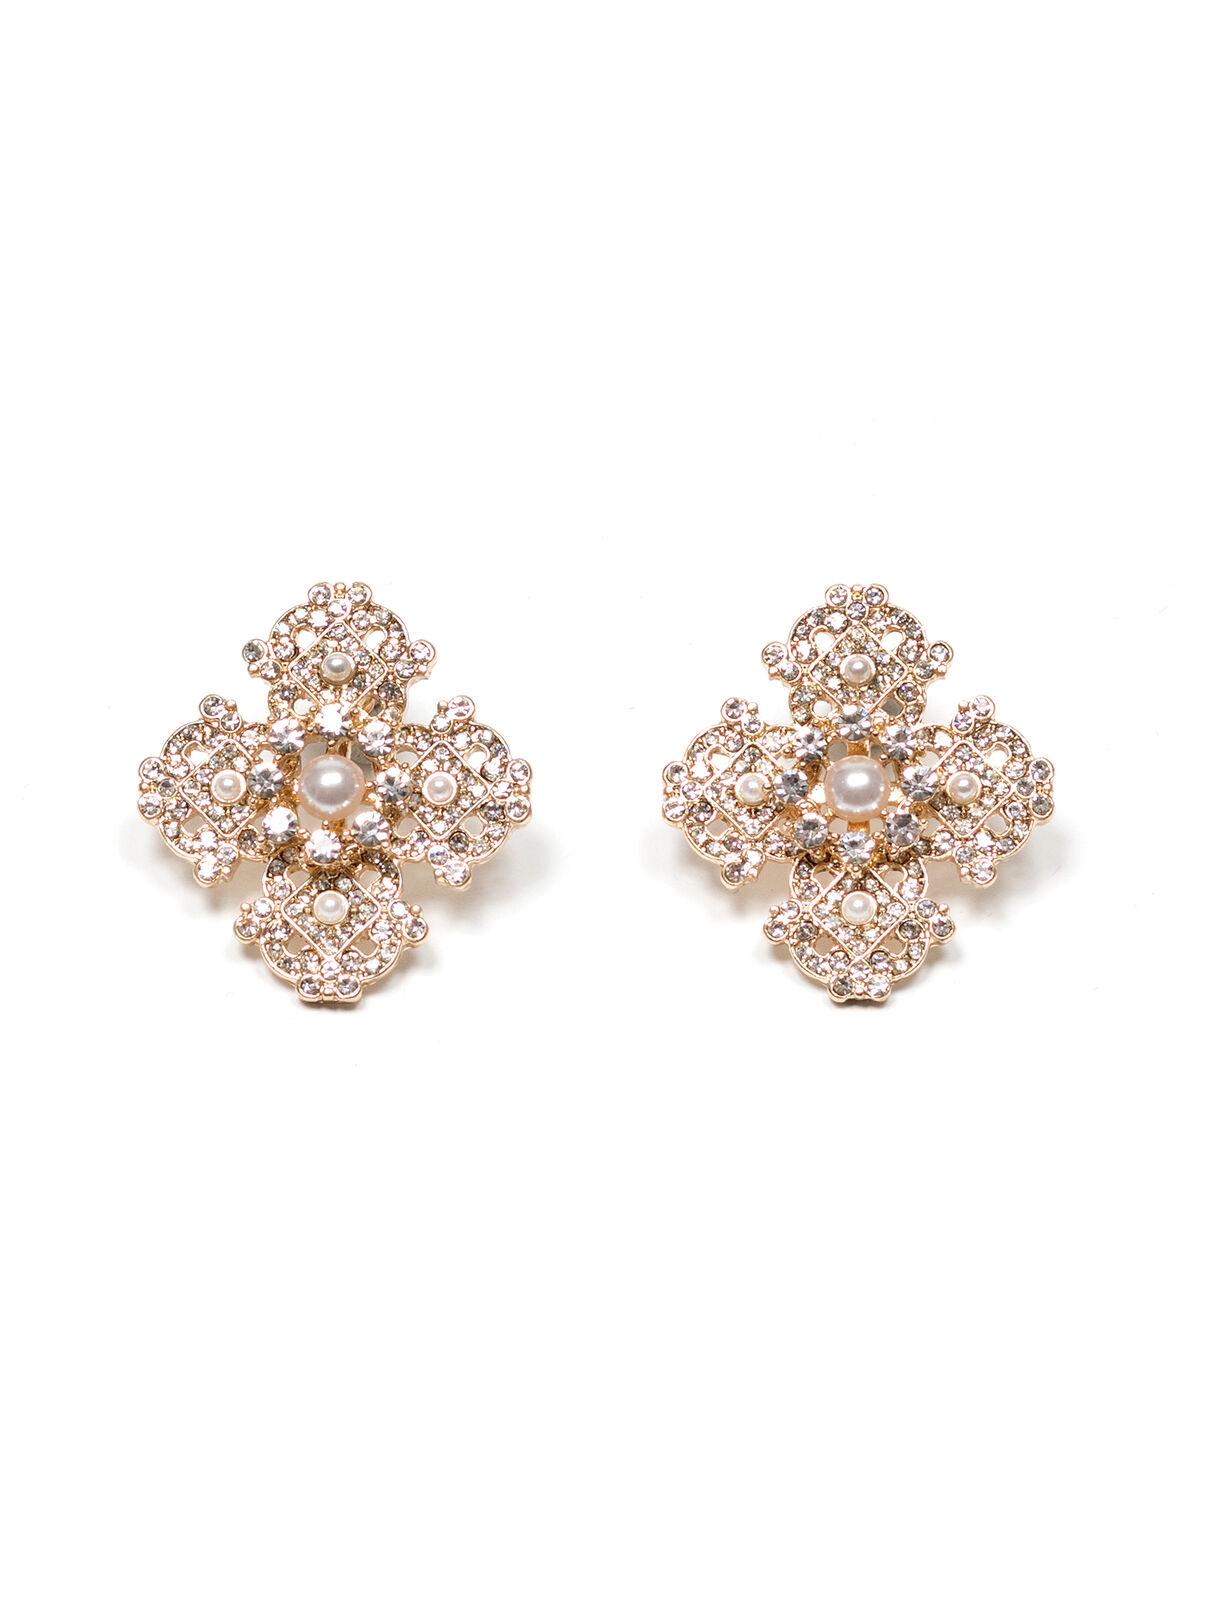 Buy Latest Trendy Earrings Online Cheap Gifts under 20 Dollars - giftforyou.store